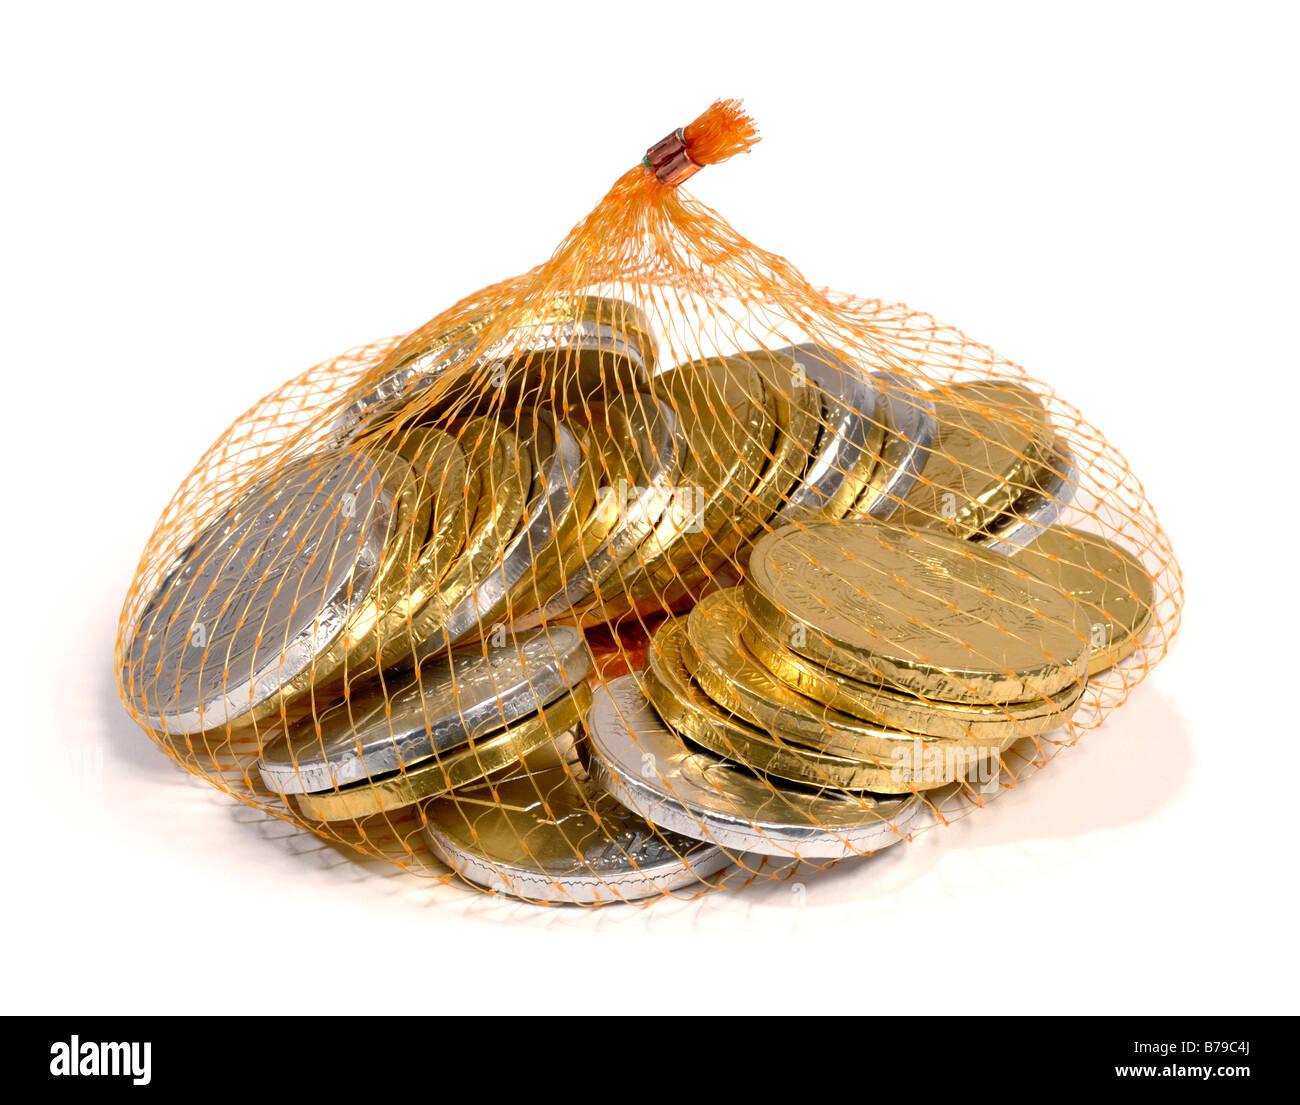 Chocolate Coins Bag Stock Photos & Chocolate Coins Bag Stock ...